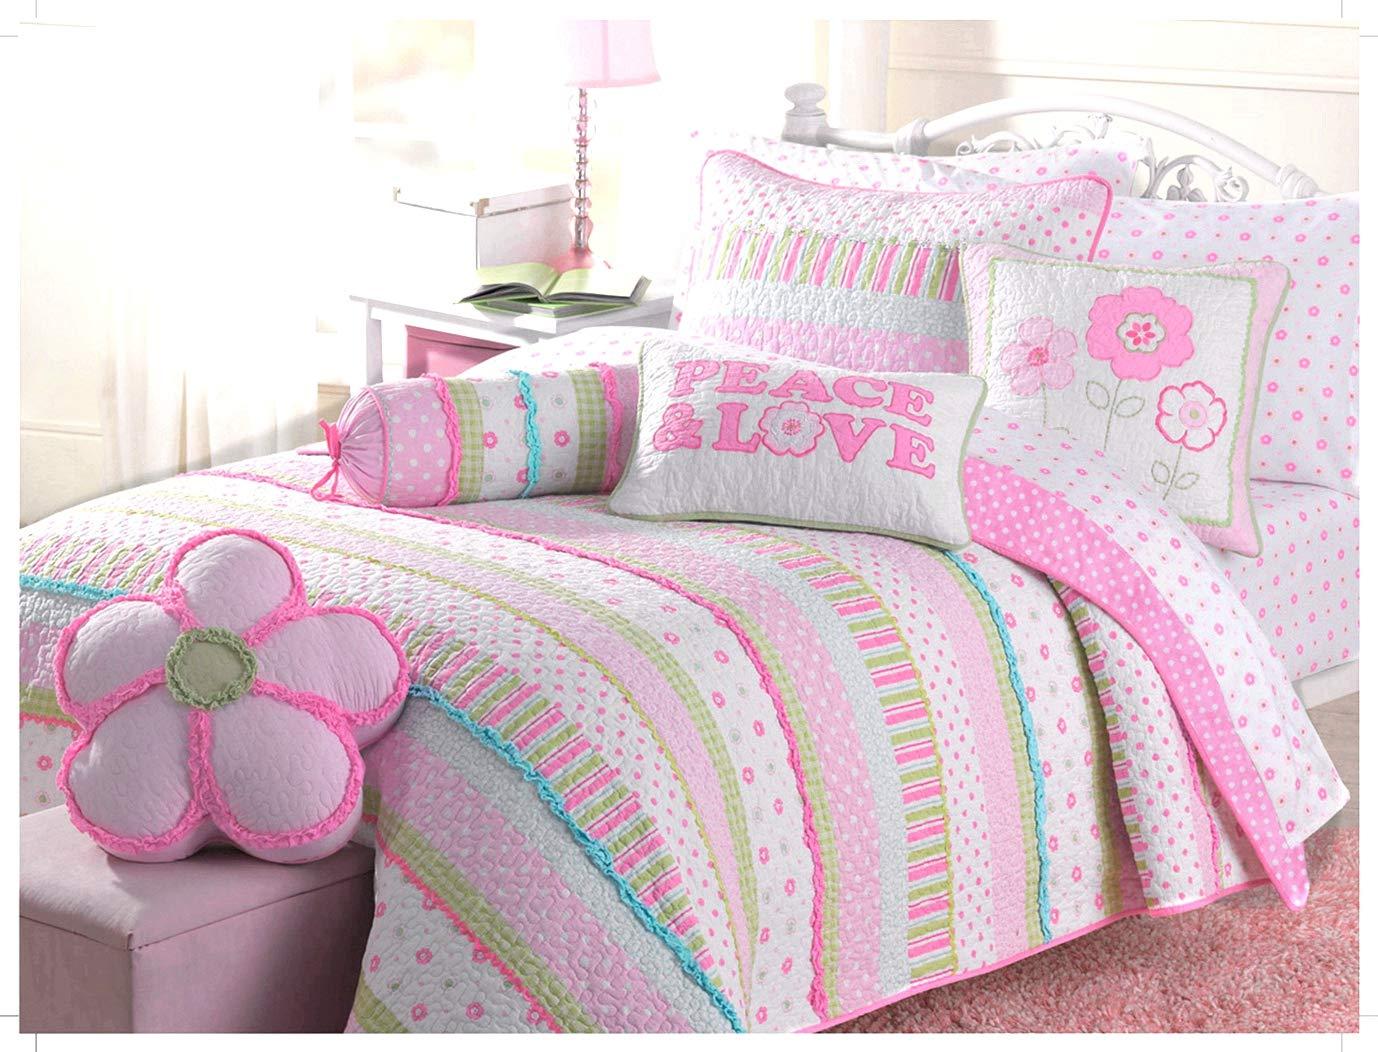 Cozy Line Home Fashions Pink Greta Pastel Polka Dot Flower 100% Cotton Reversible Quilt Bedding Set, Coverlet, Bedspreads (Twin - 2 Piece: 1 Quilt + 1 Standard Sham) by Cozy Line Home Fashions